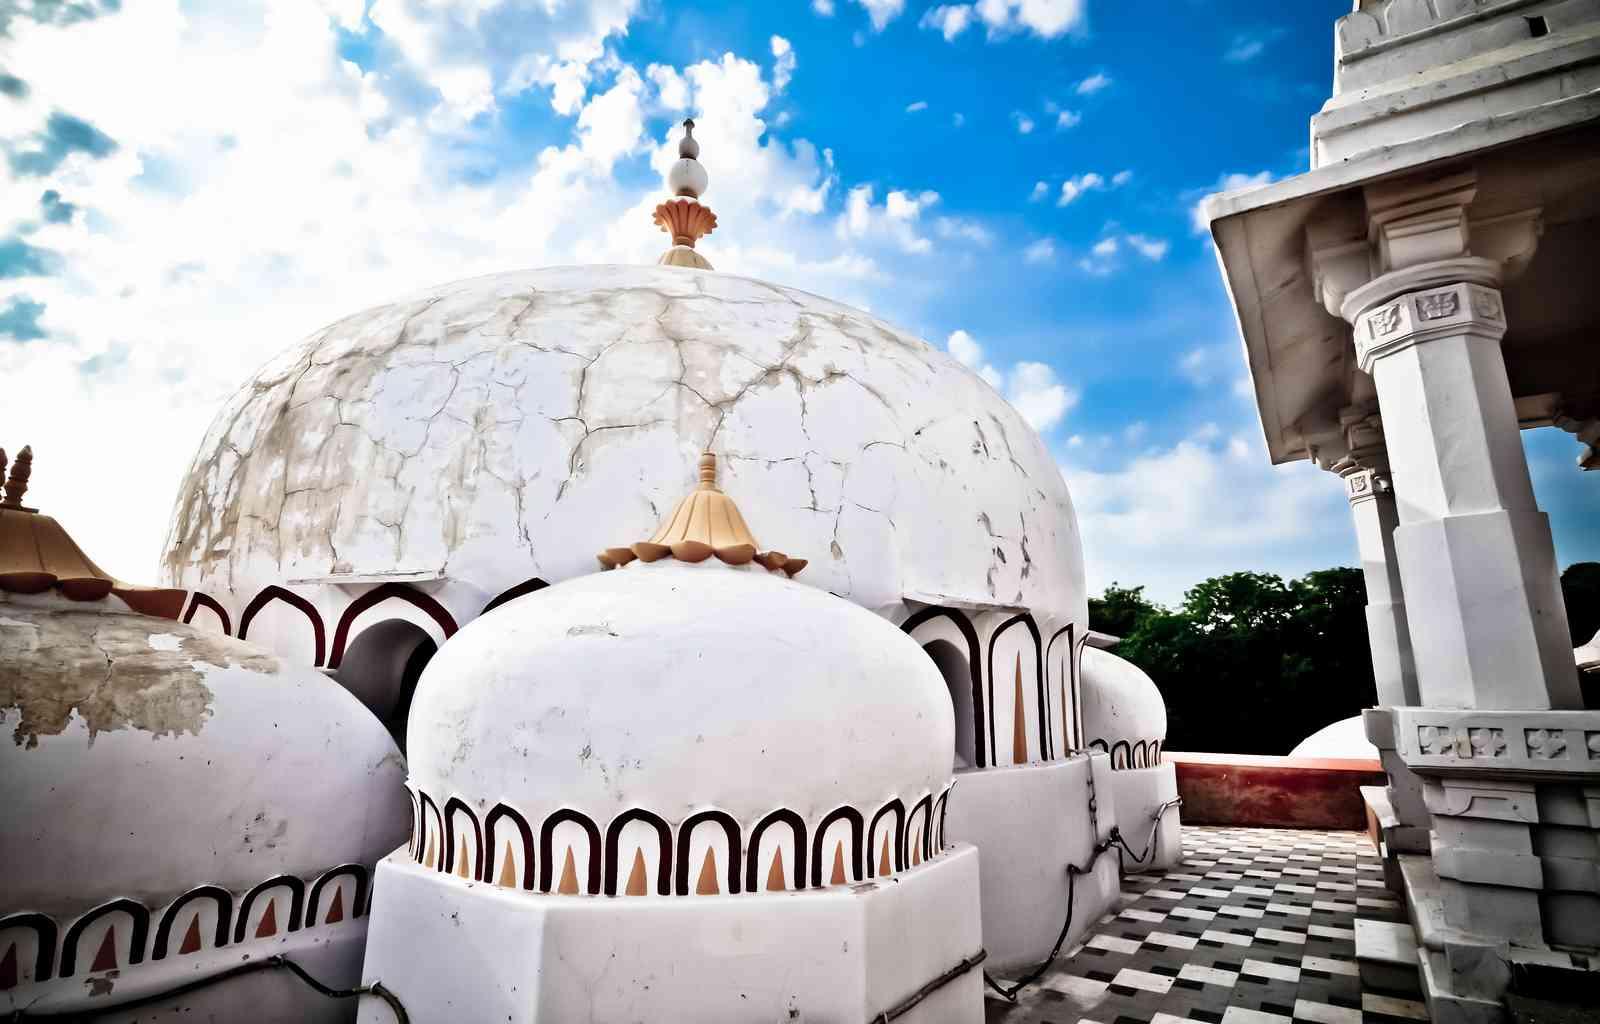 Bhandasar (Banda Shah) Jain Temple